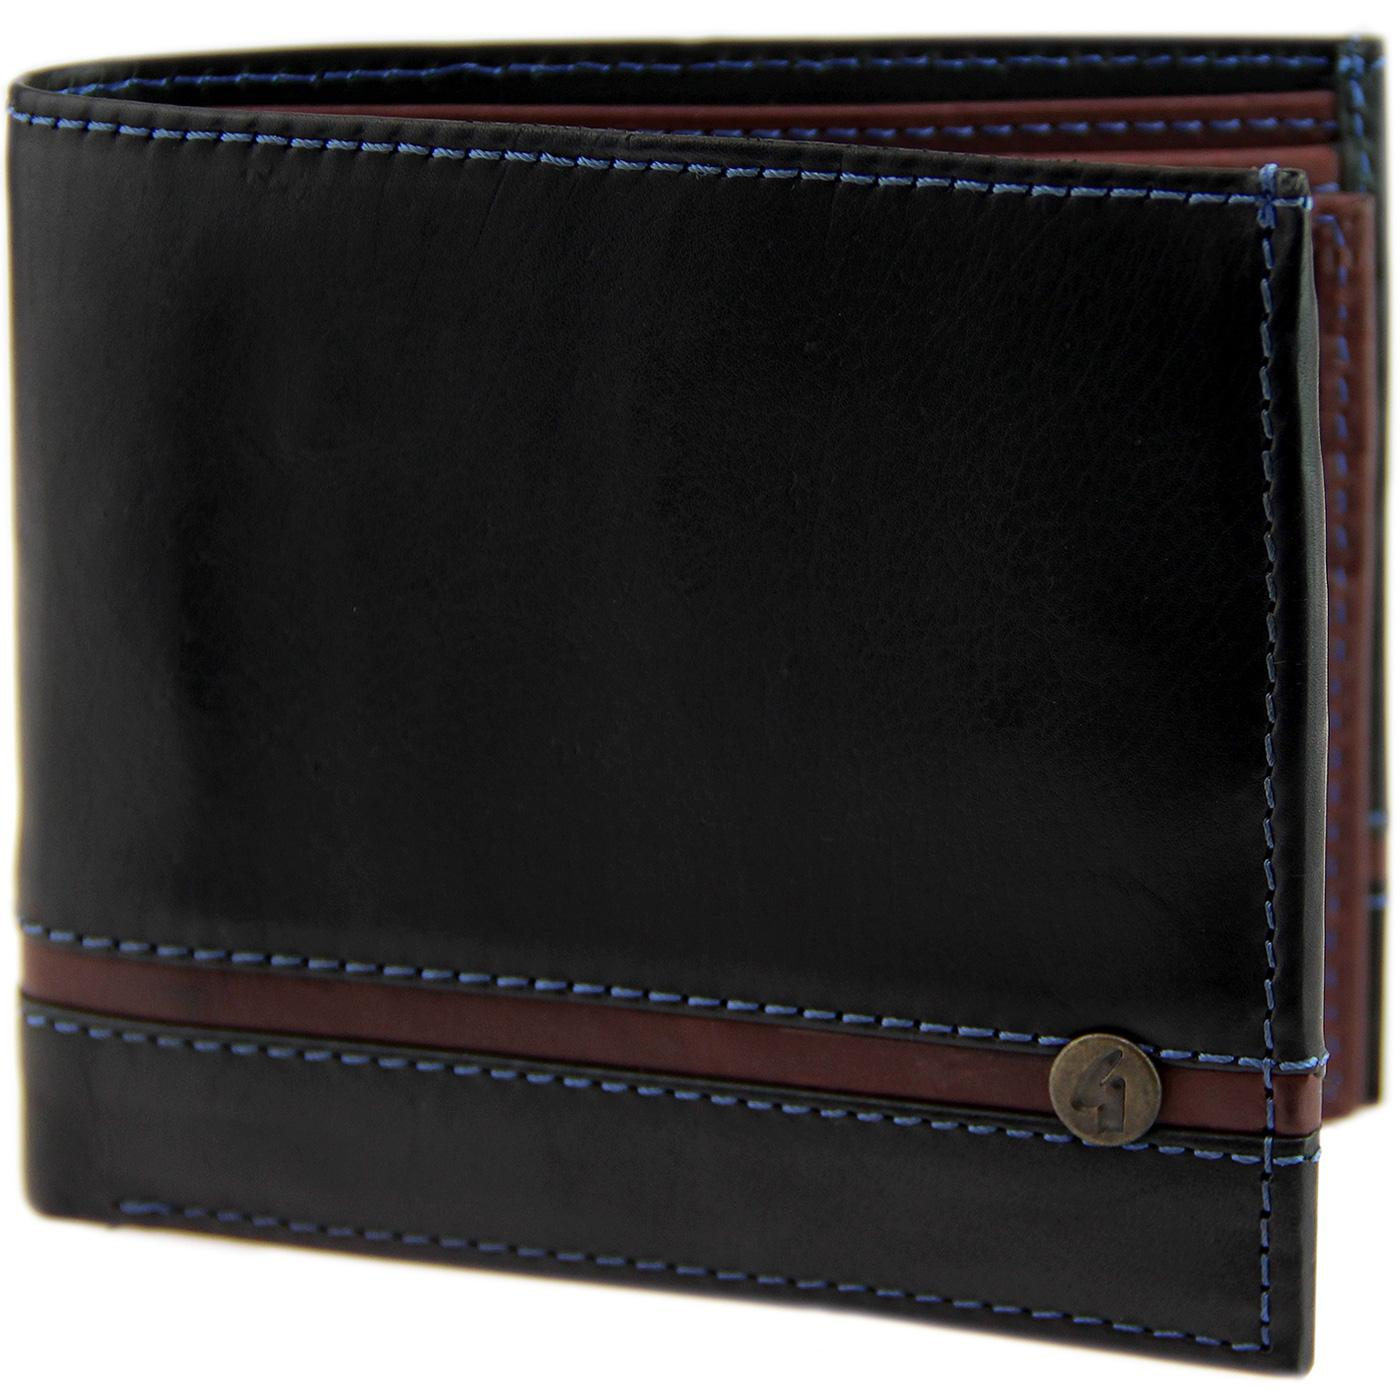 GABICCI VINTAGE Retro Leather Gatefold Wallet (B)